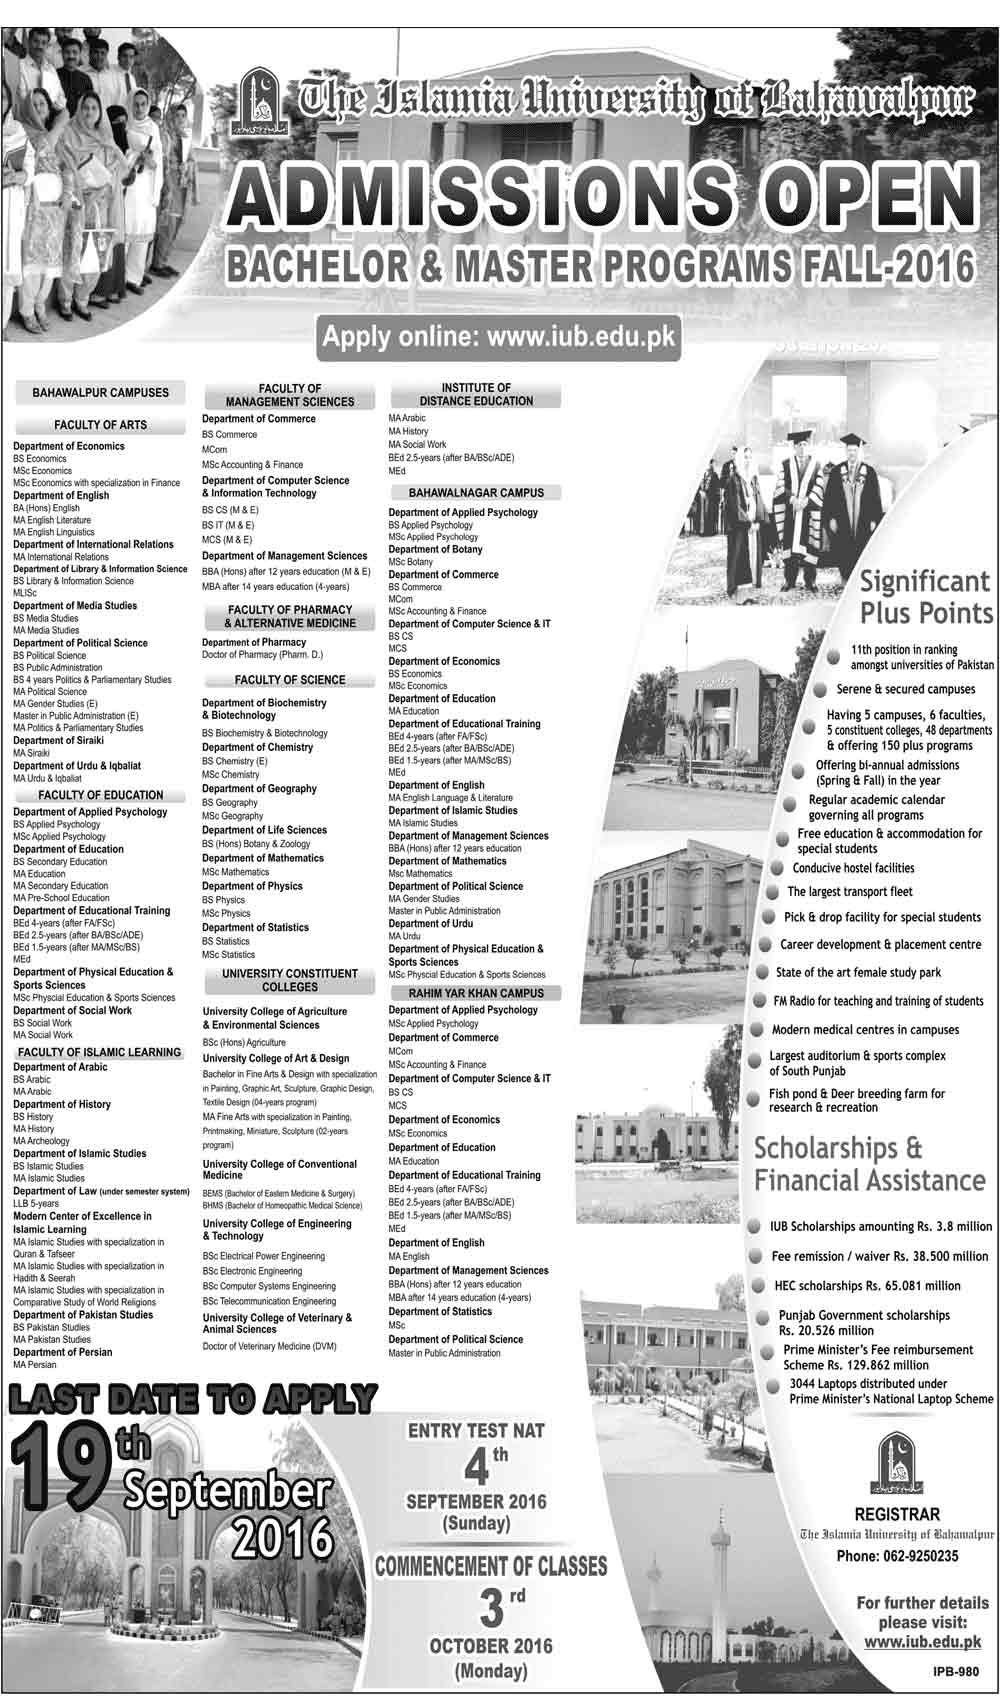 Islamic University of Bahawalpur IUB Admission 2016